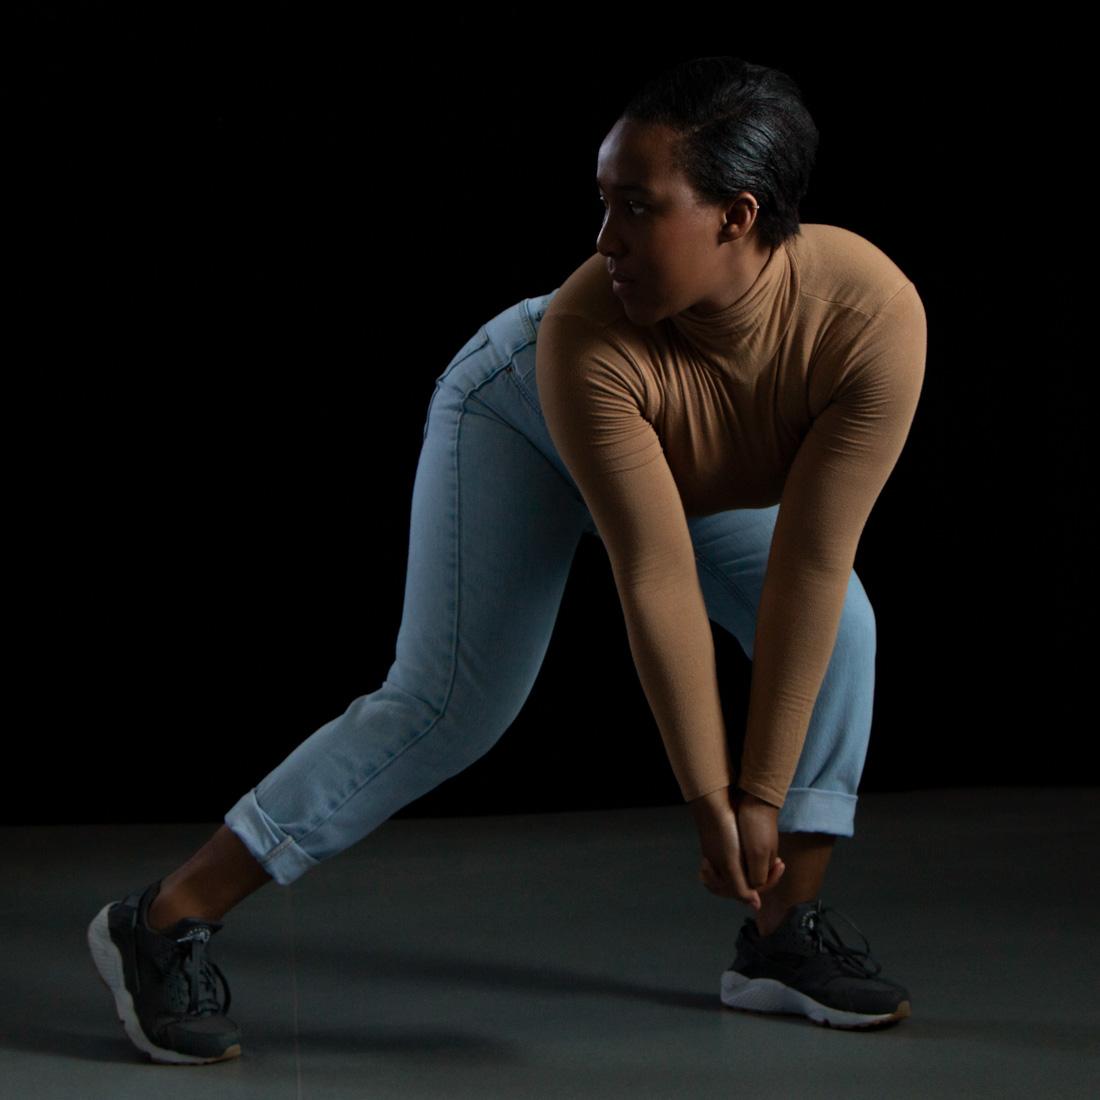 Dance photographer Birmingham, dance photography Birmingham and West Midlands U.K., studio dance photoshoot for a street dancer Gemma. Dance portfolio photoshoot Birmingham